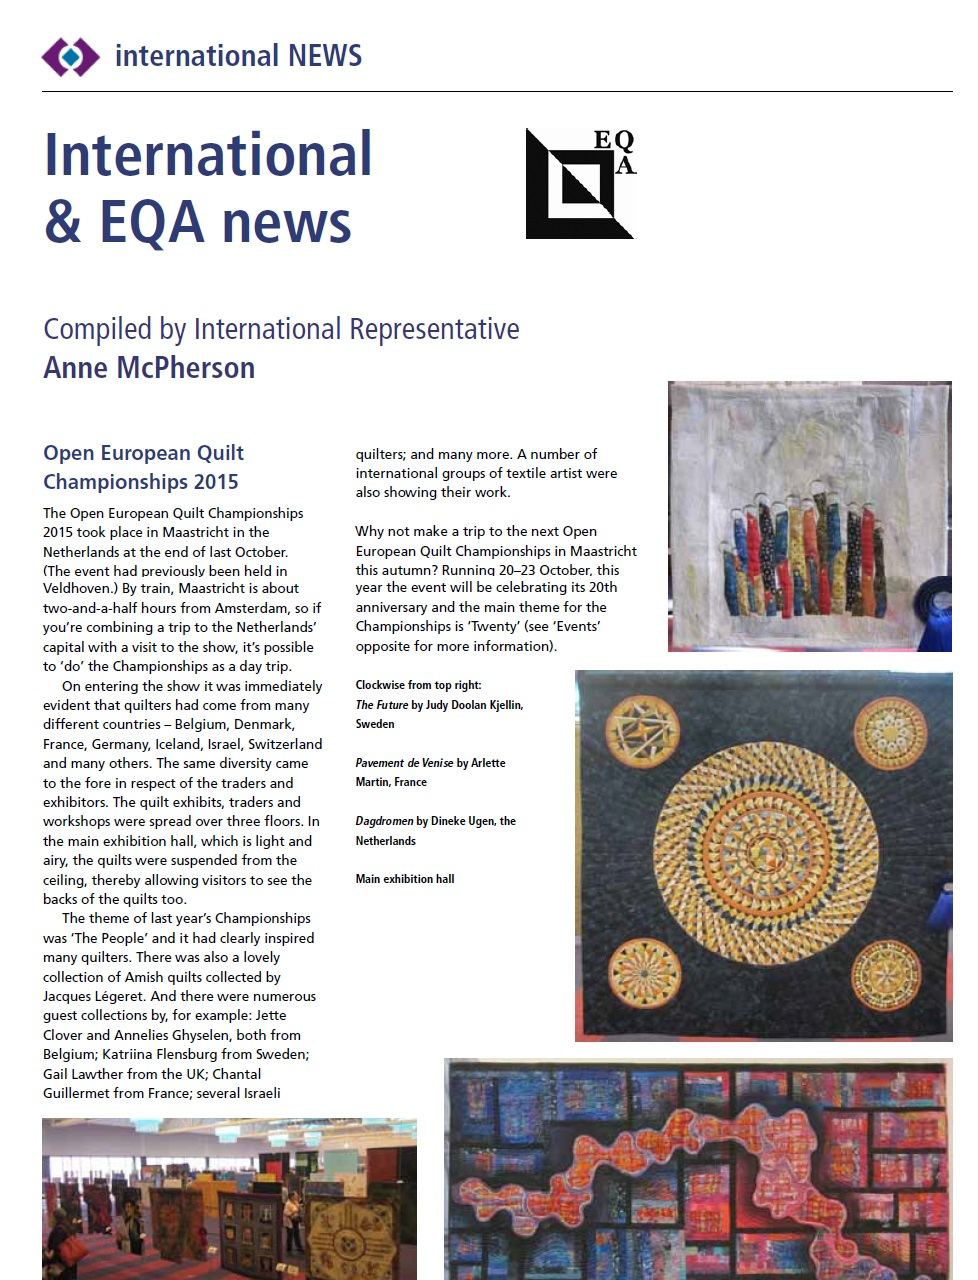 International Quilt News - Issue 147